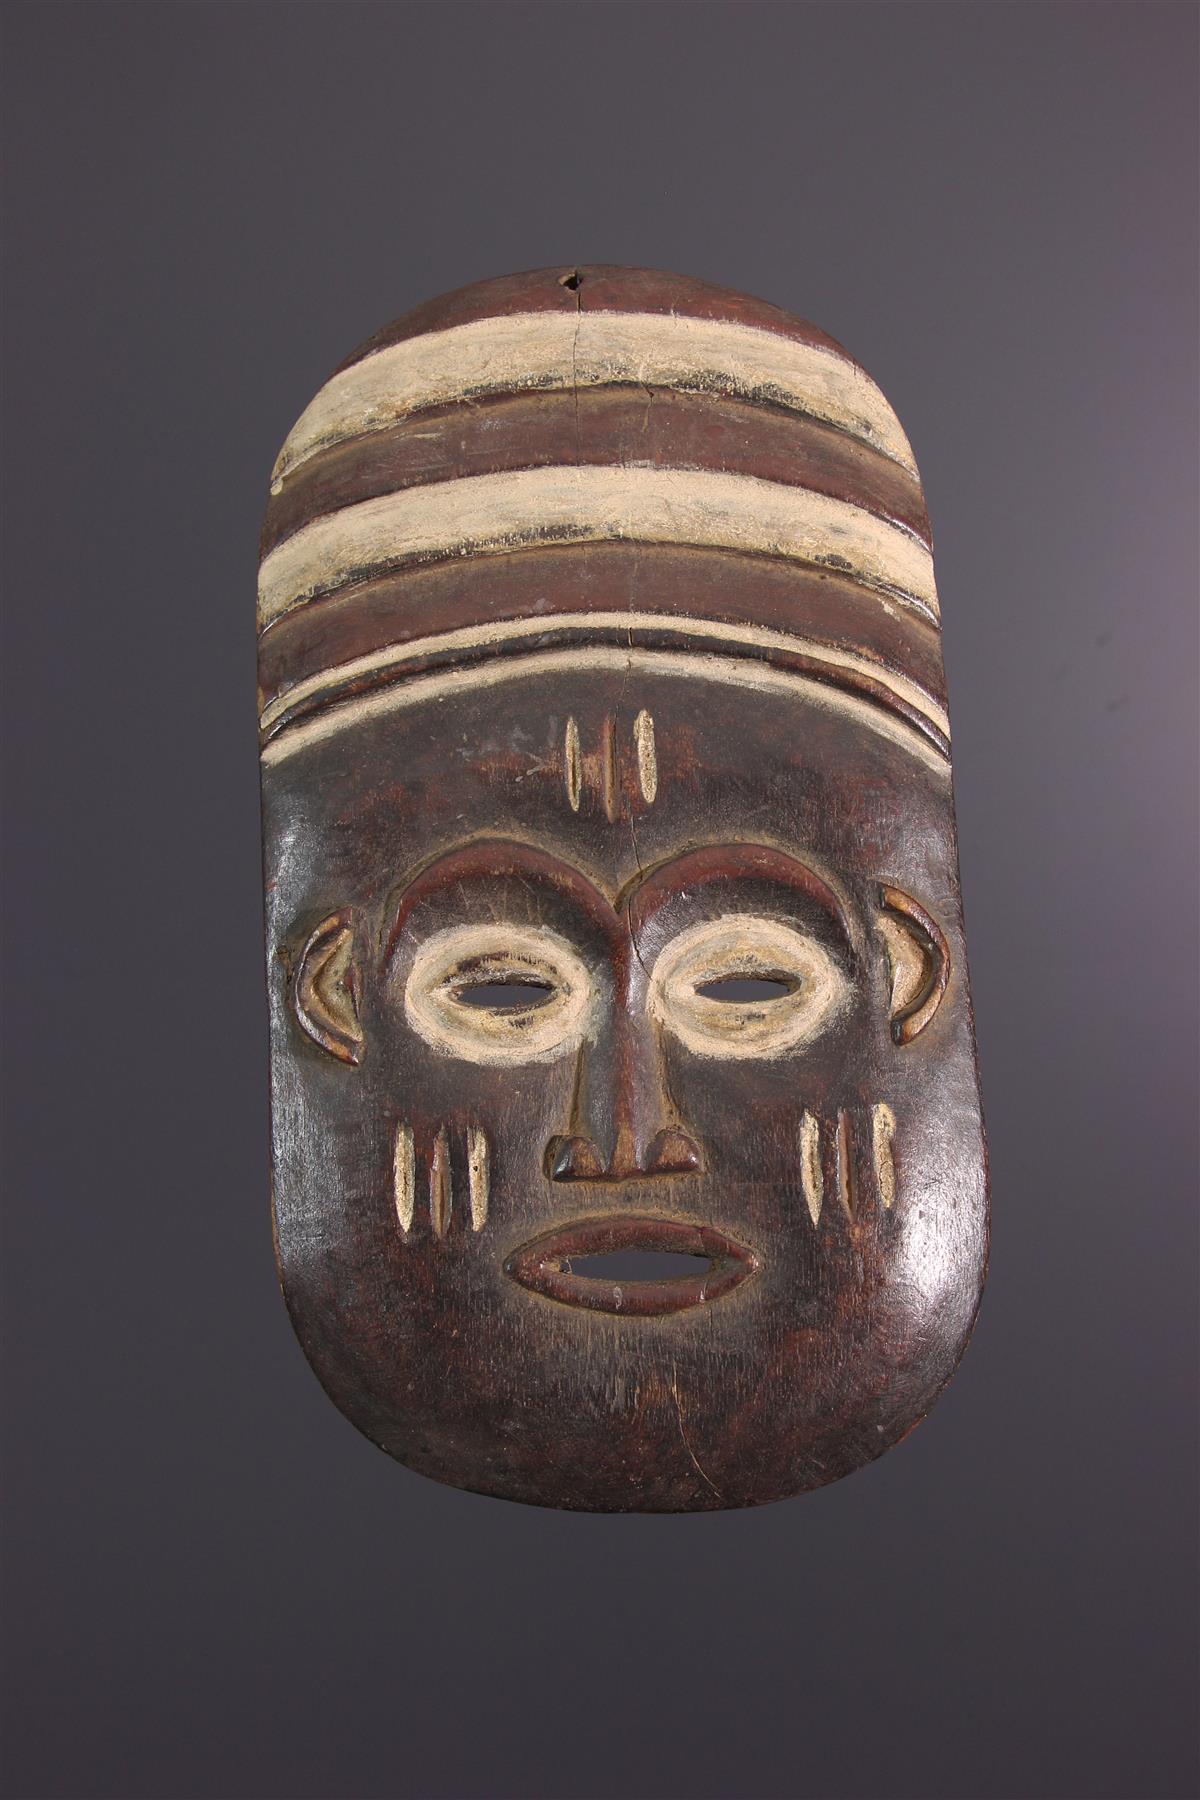 Lele masker - Afrikaanse kunst